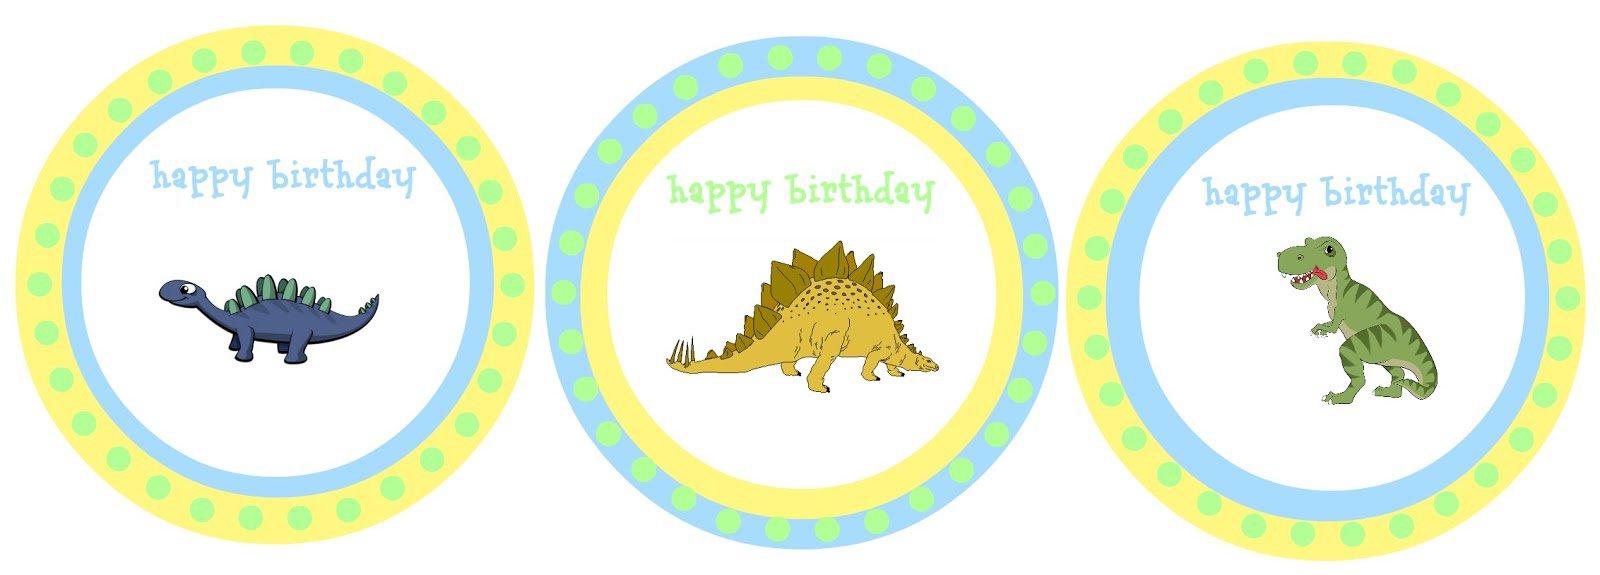 Free Printable Dinosaur Party Decorations